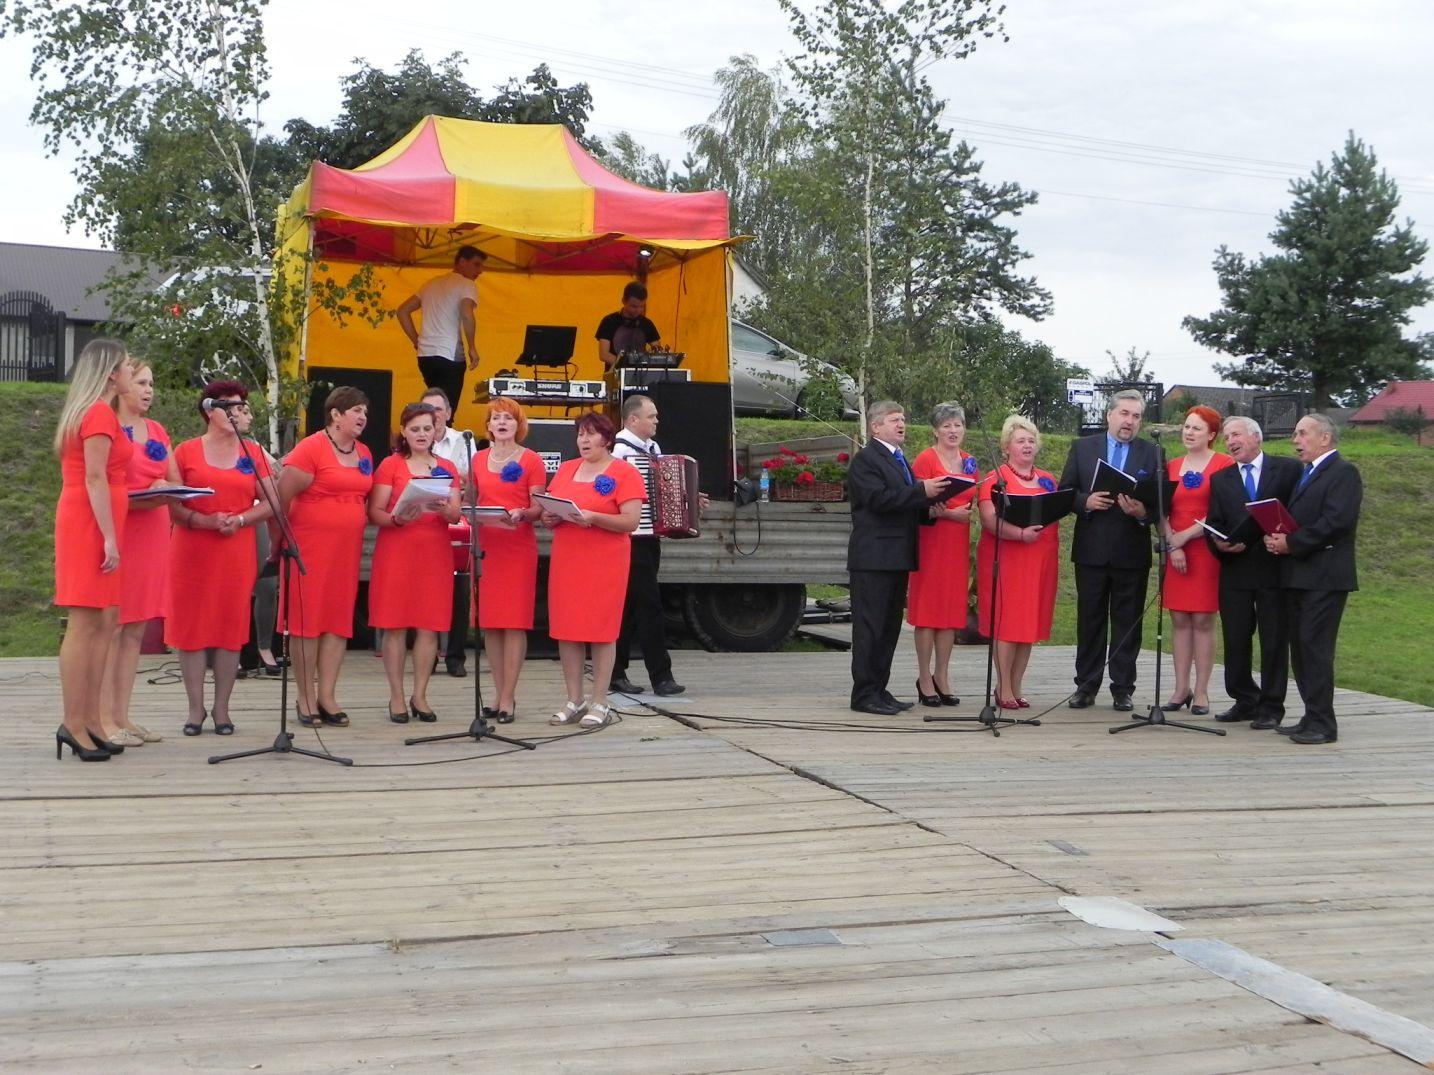 2016-07-17 Mroczkowice festyn (18)